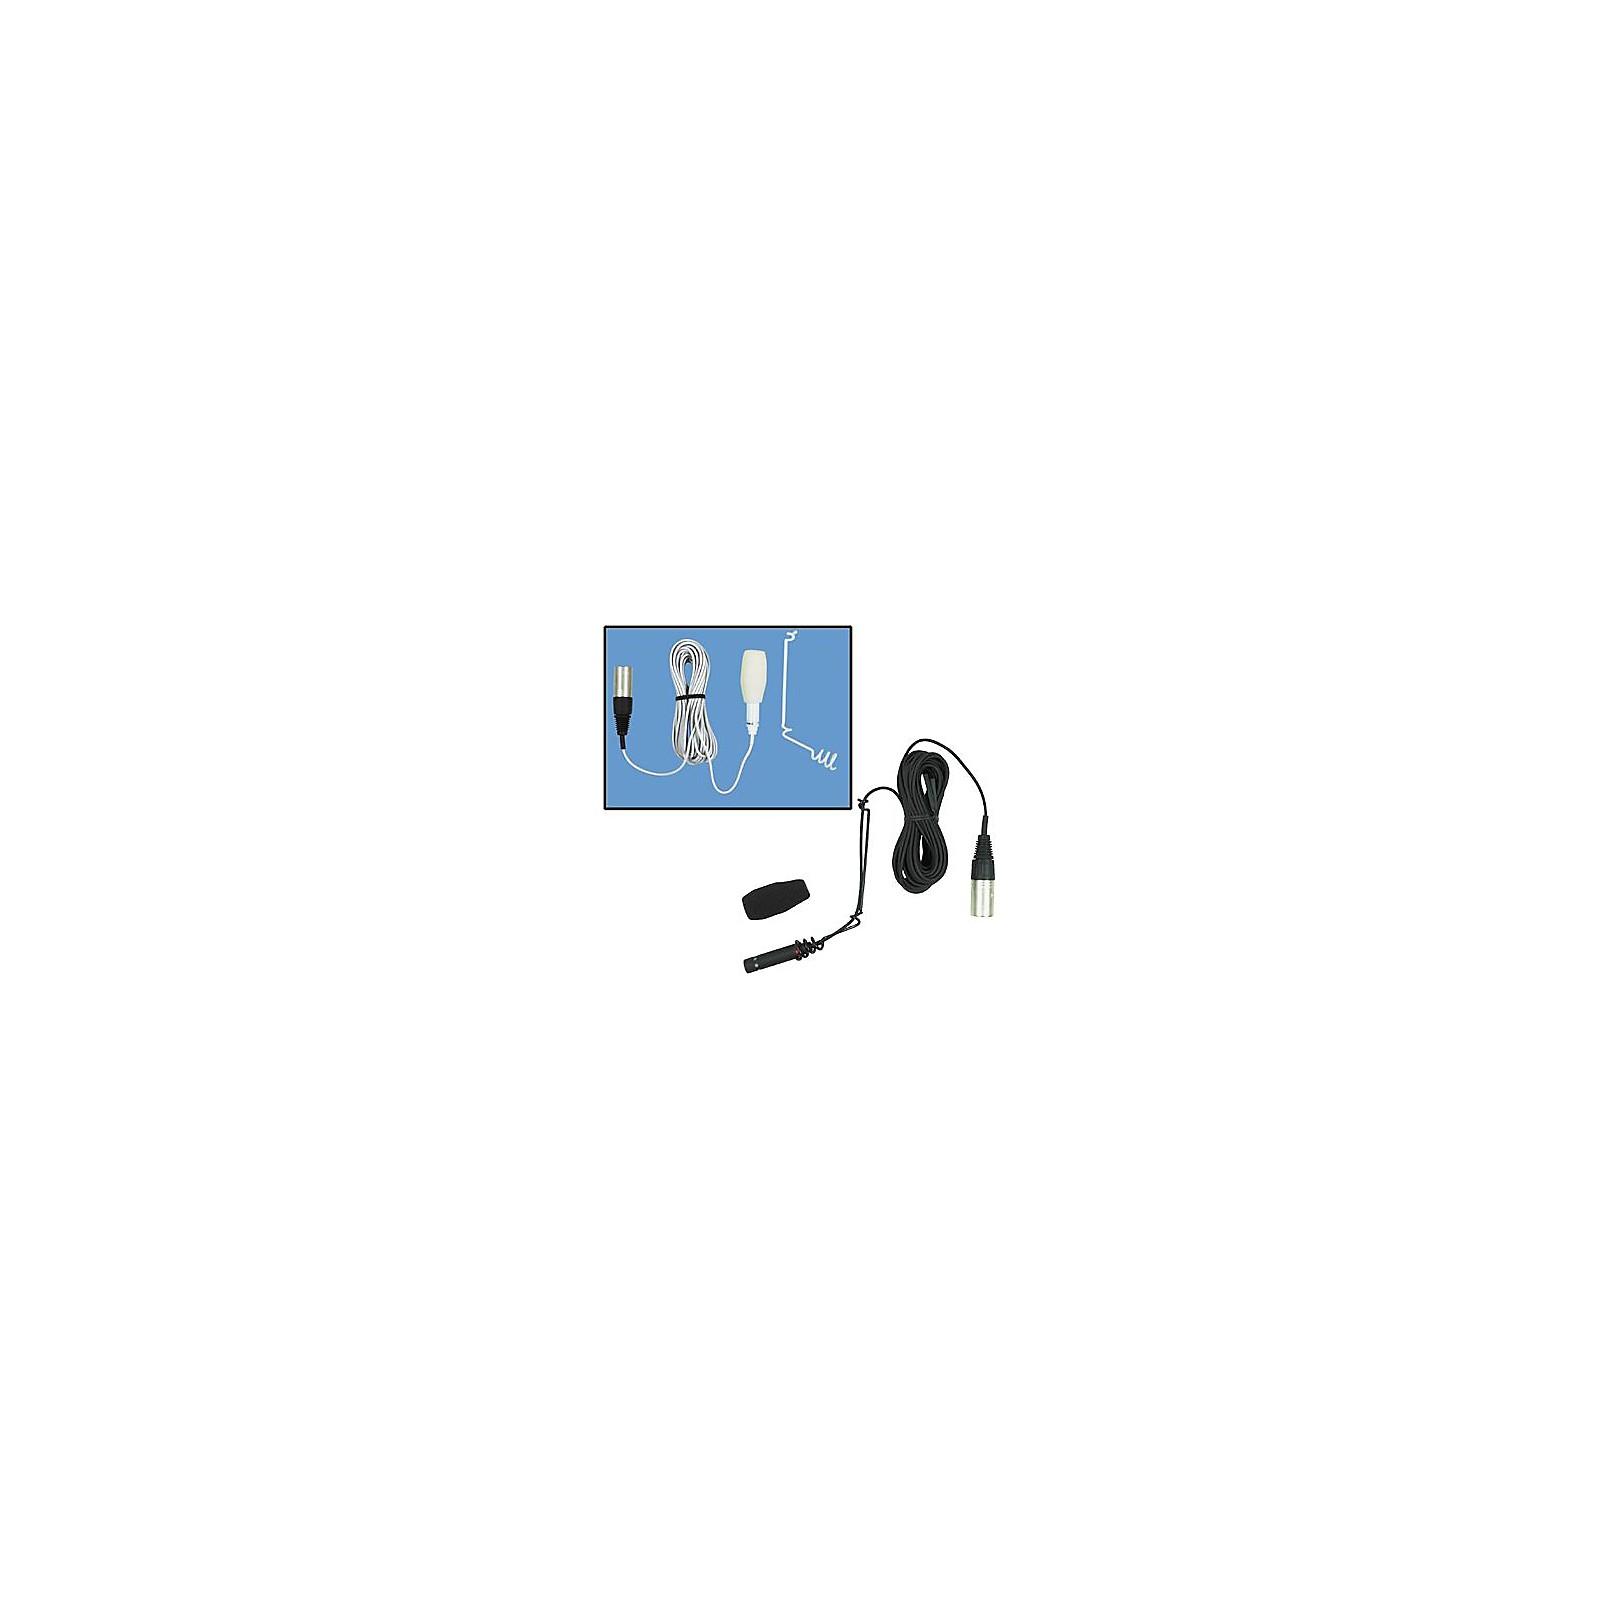 Open Box Audio-Technica PRO 45 Cardioid Condenser Hanging Mic